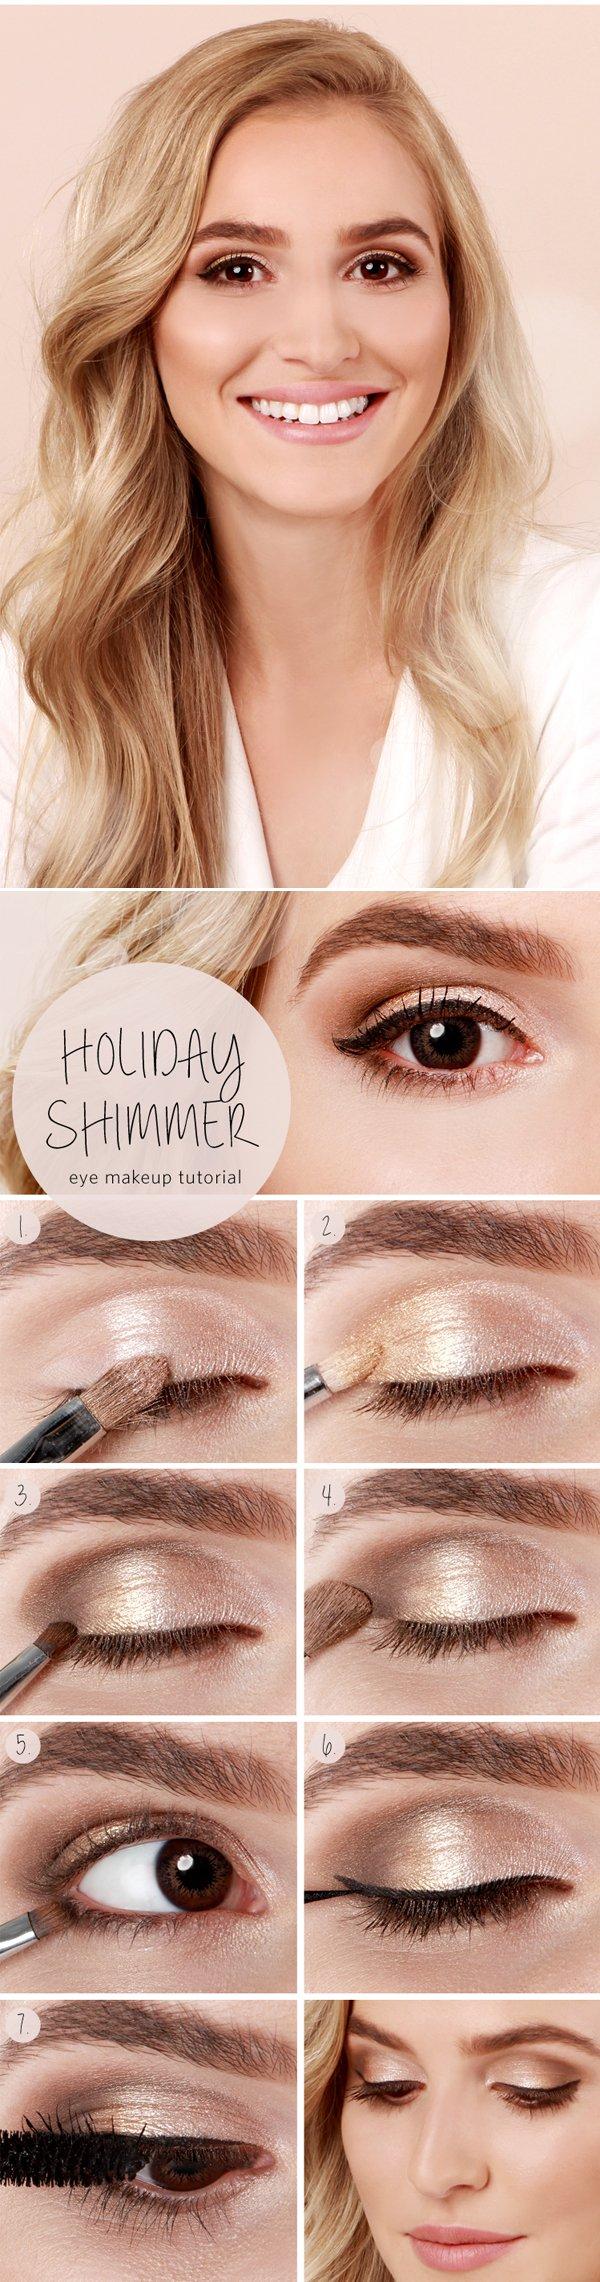 макіяж для блондинок